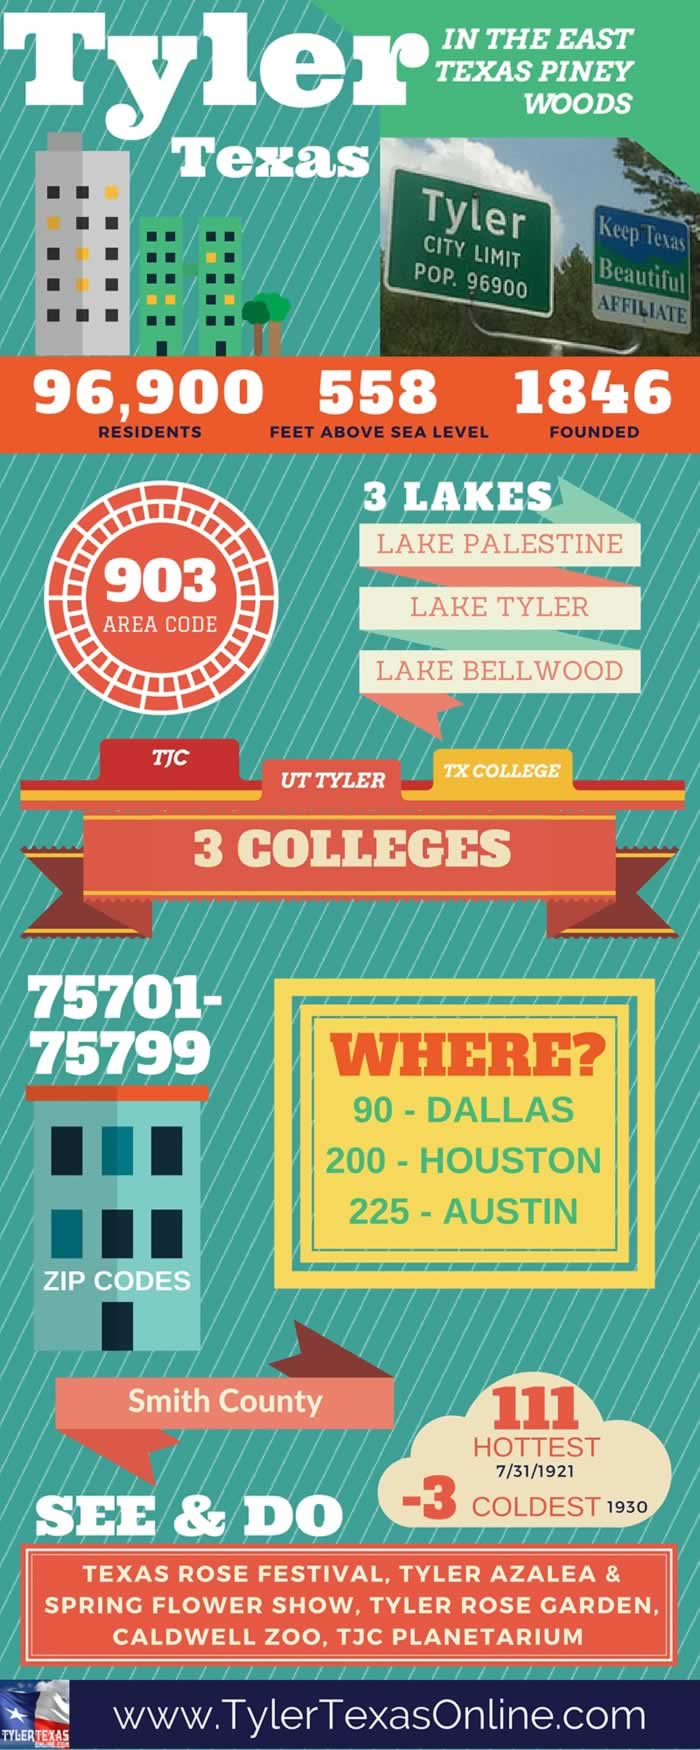 tyler texas infographic for pinterest  facebook or other social media